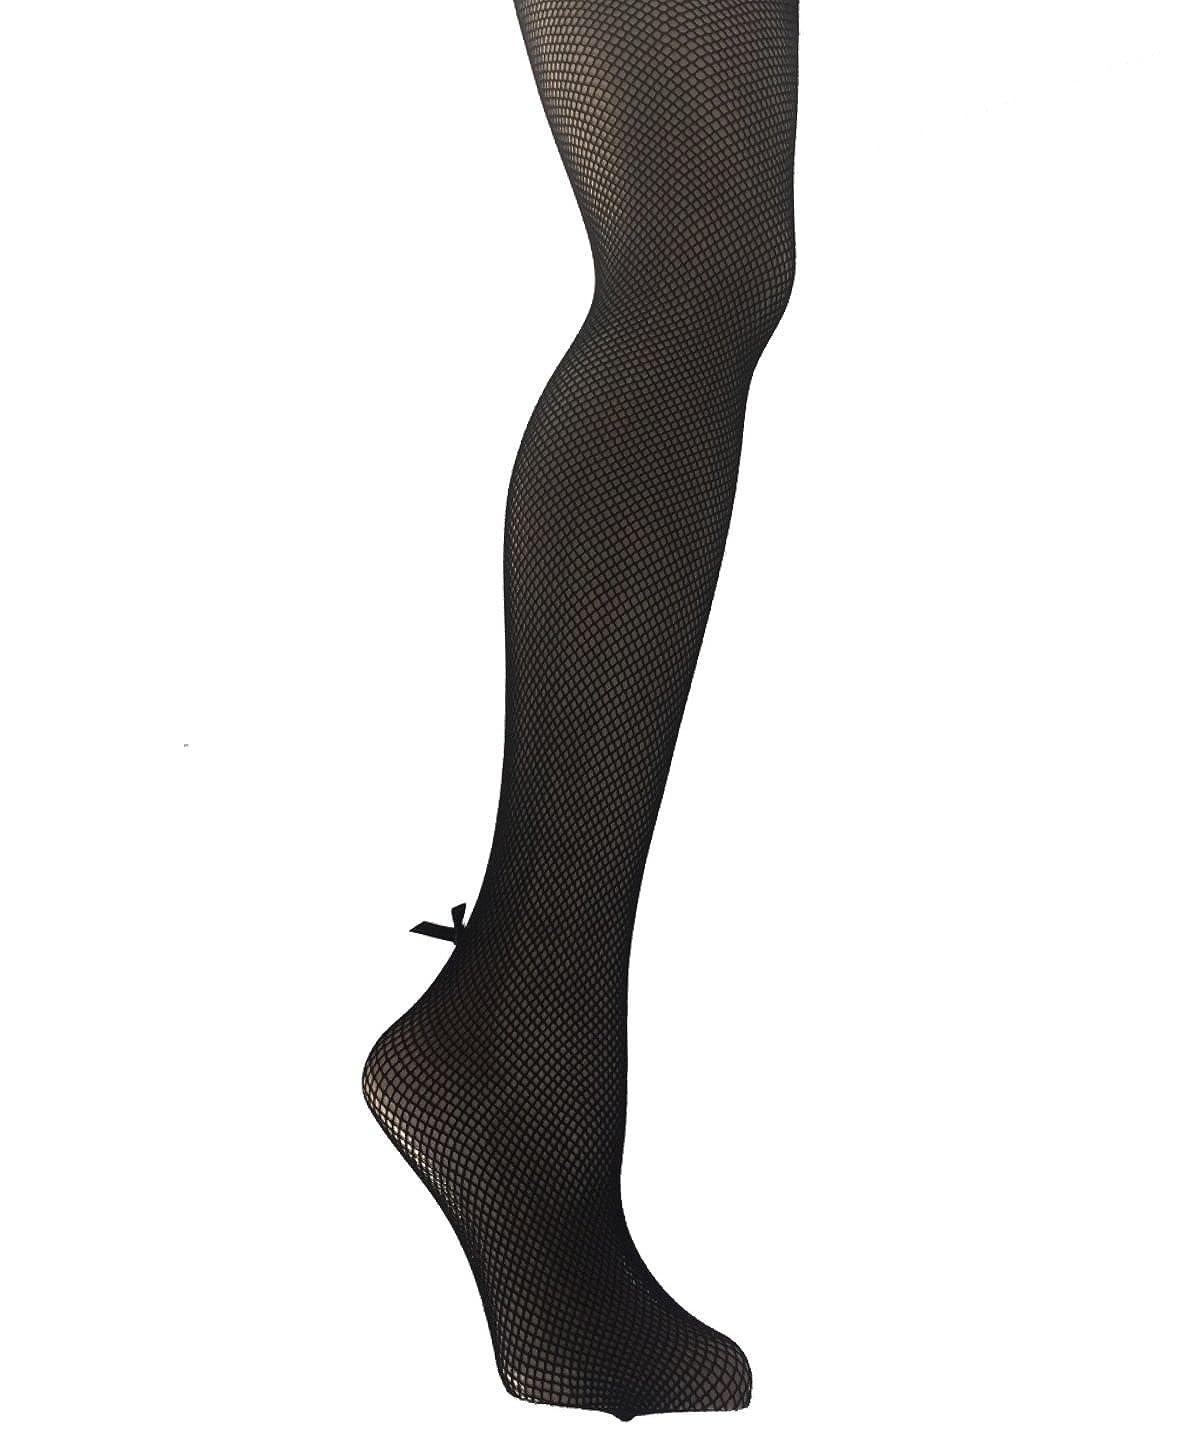 13abfaf63 Yelete Killer Legs Womens Queen Plus Size Fishnet Pantyhose 168YD022Q